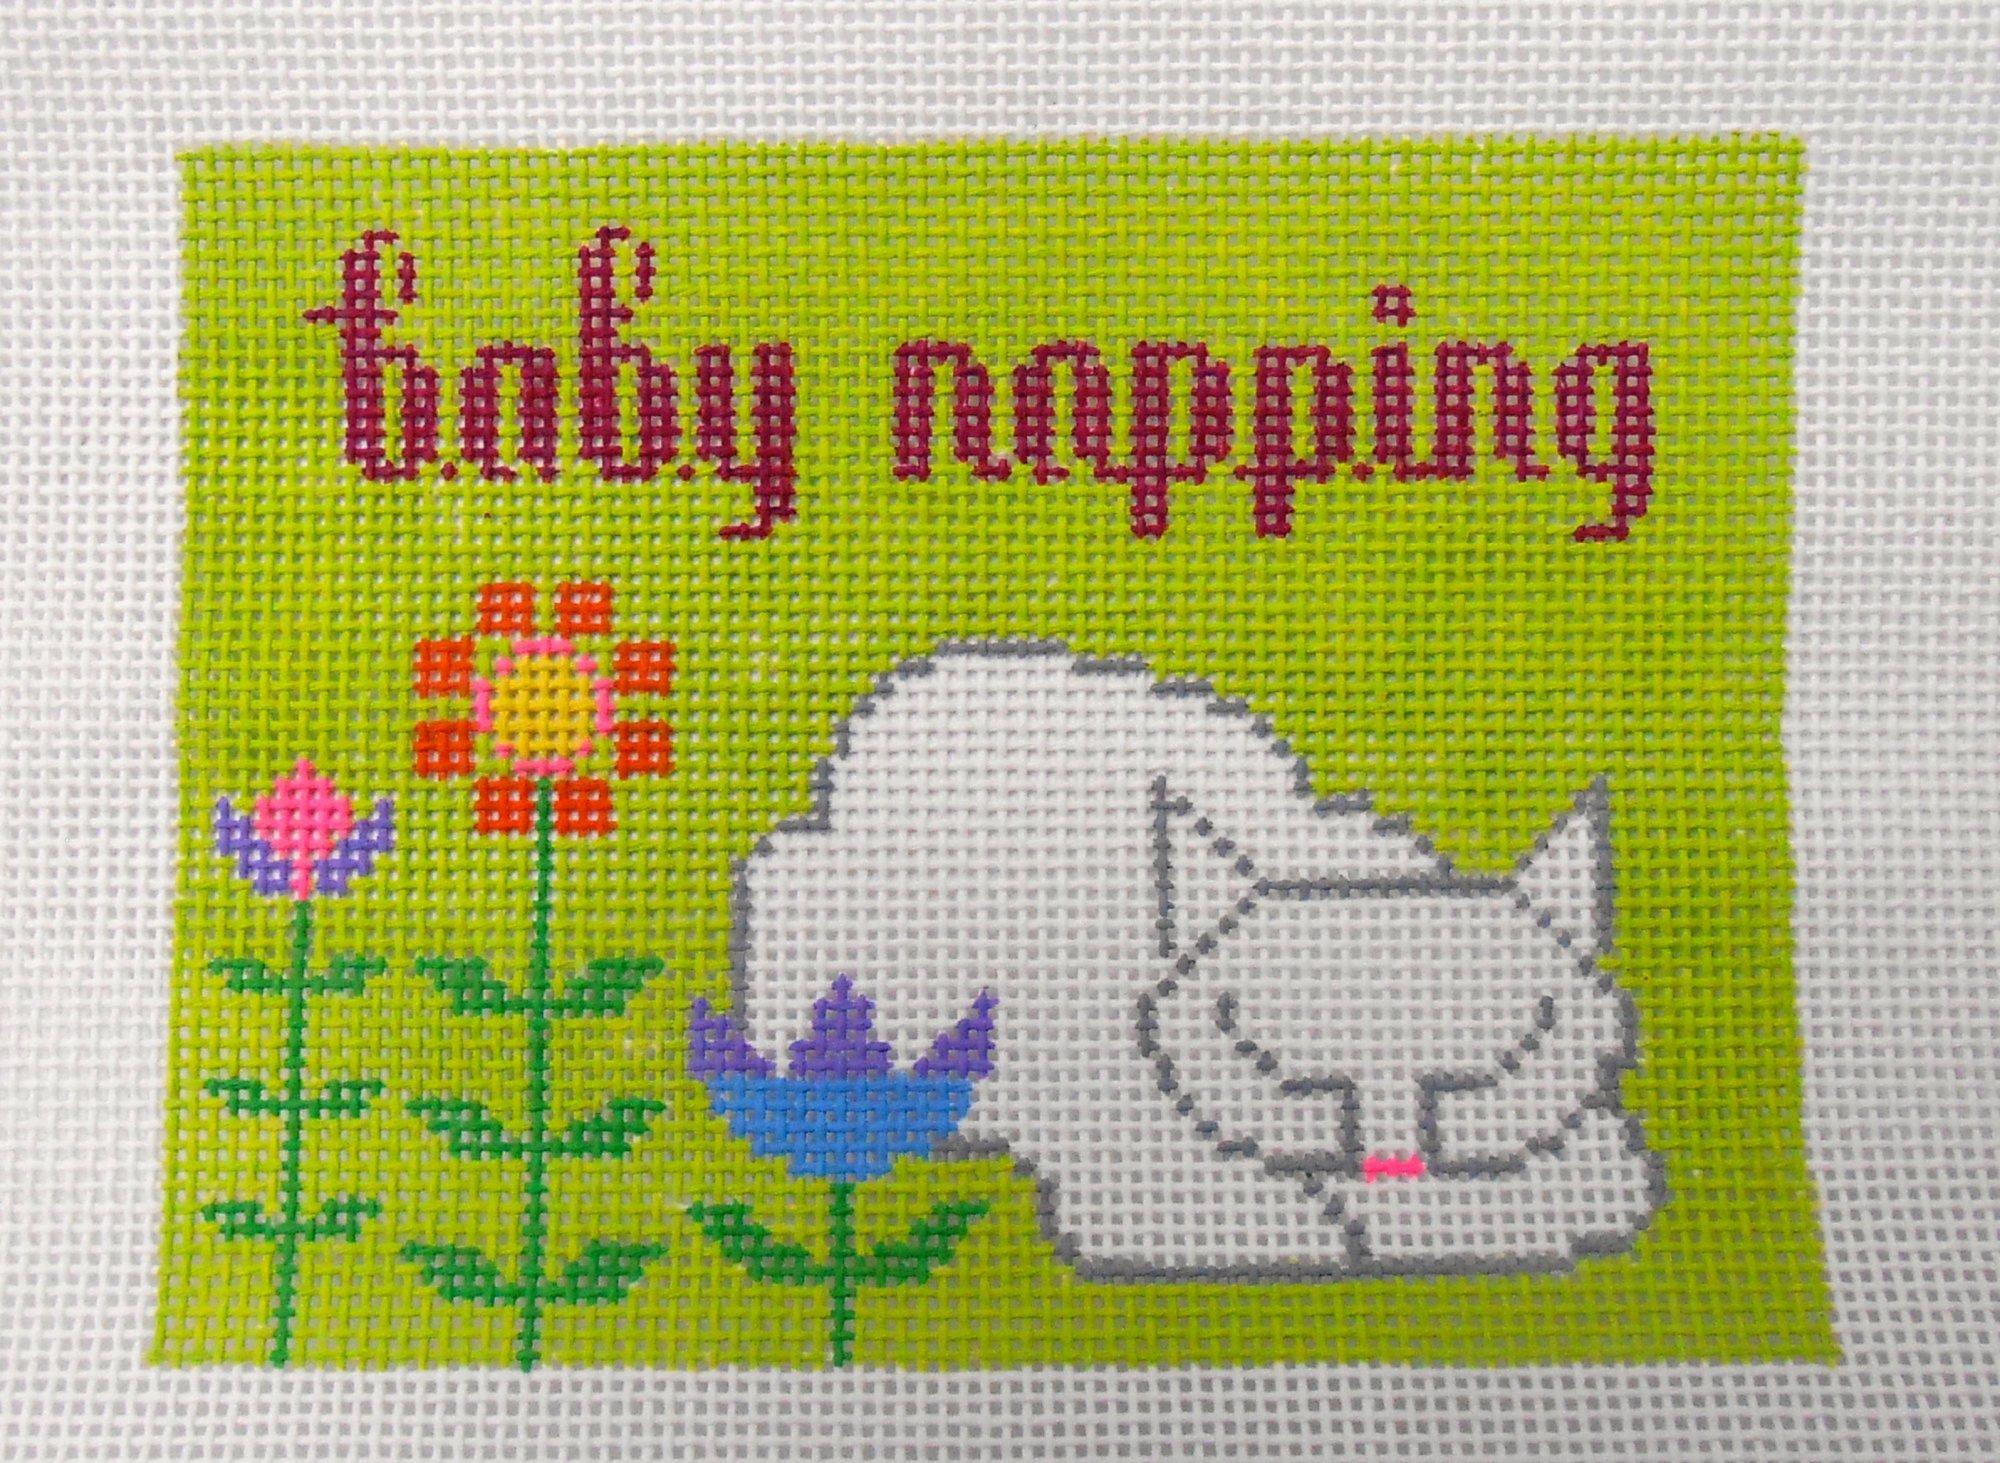 Baby Napping - Kitty